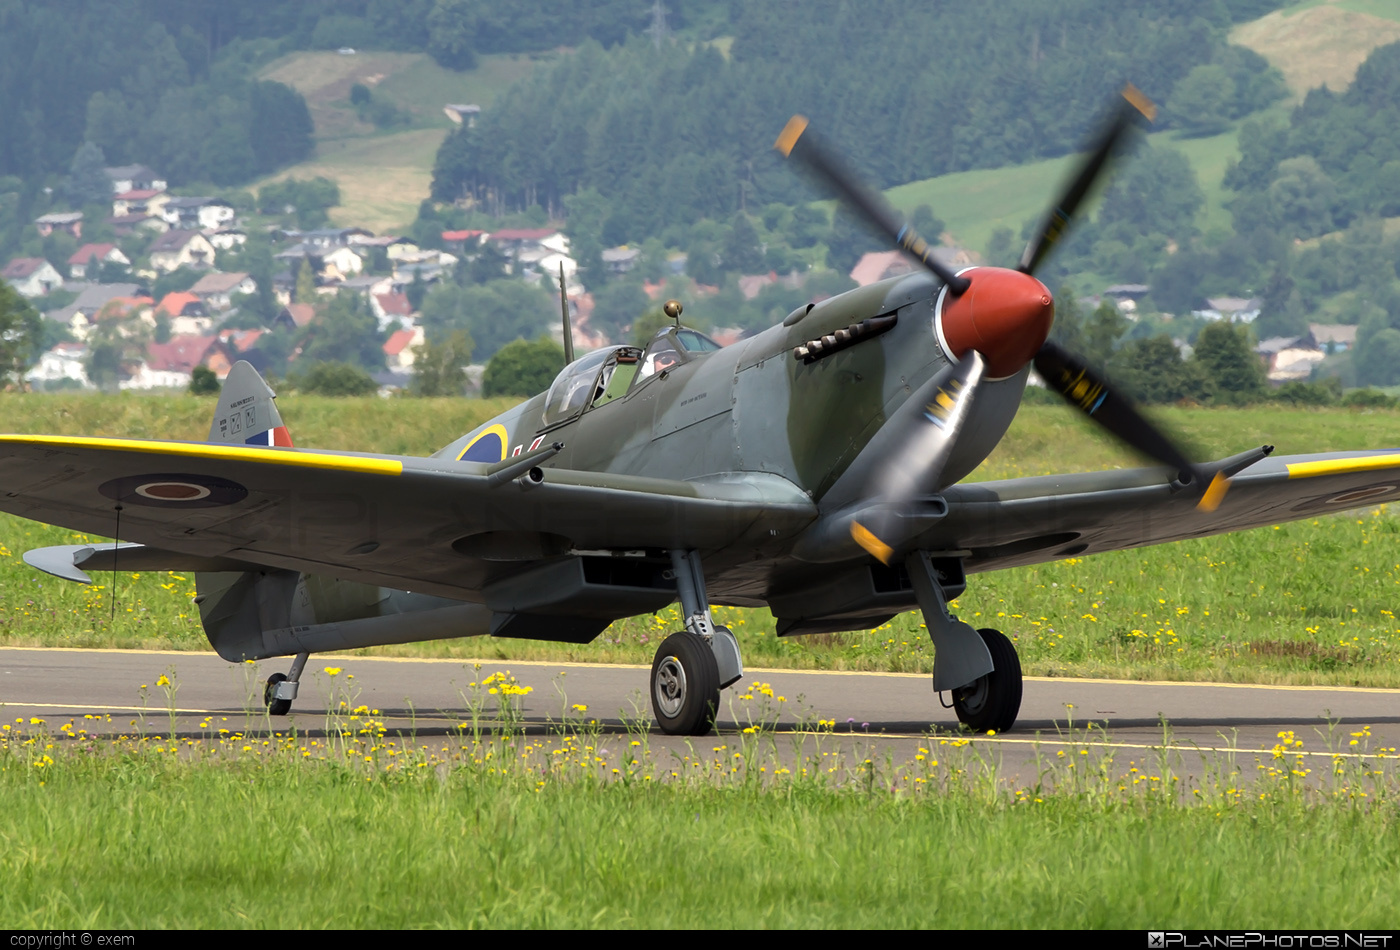 Supermarine Spitfire LF Mk.XVIe - G-MXVI operated by Private operator #airpower #airpower2013 #spitfire #spitfirelfmkxvie #supermarine #supermarinespitfire #supermarinespitfirelfmkxvie